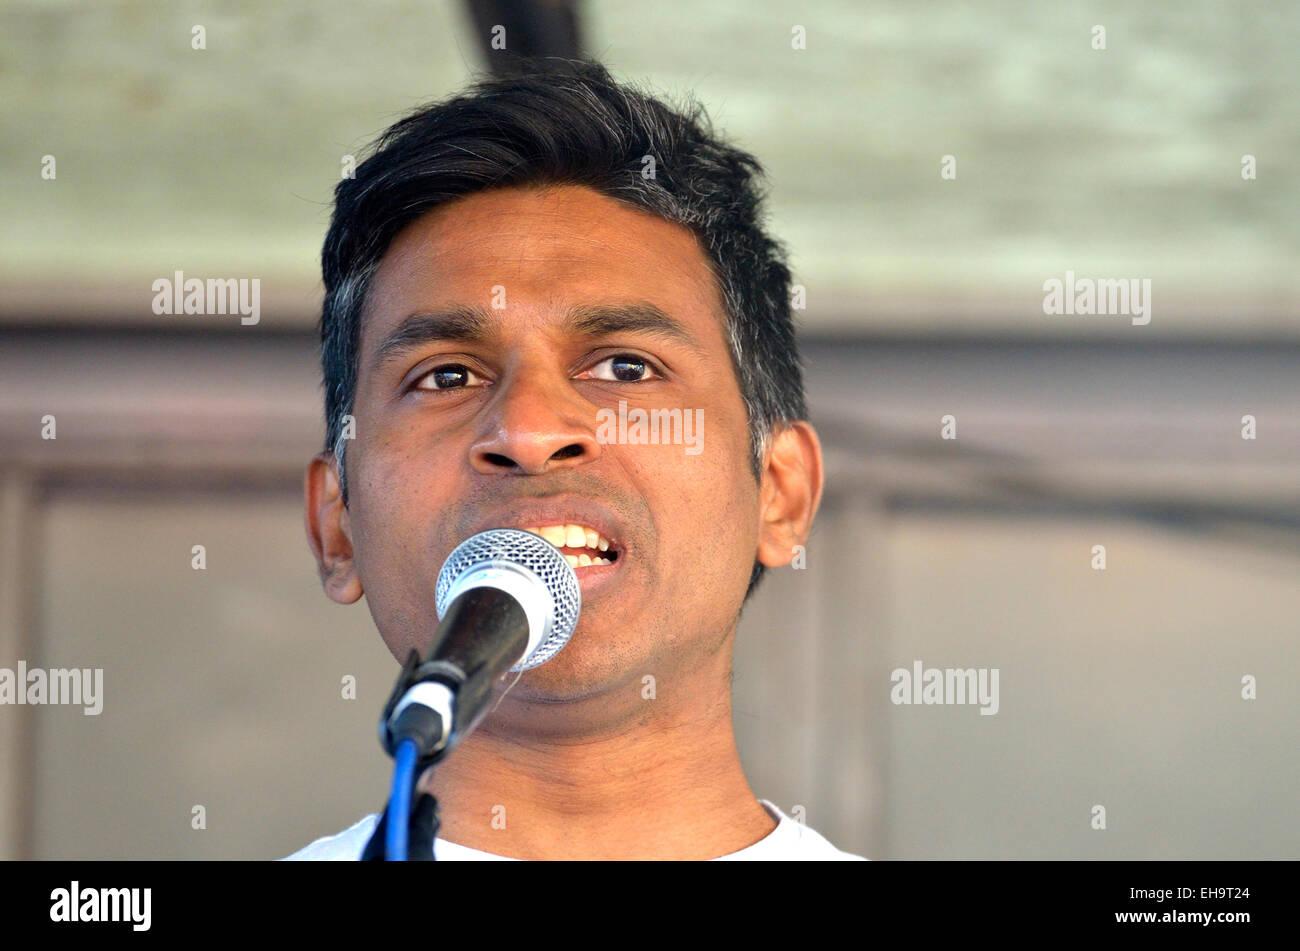 Denis Fernando, Unite Against Fascism, Rainbow Coalition against Racism, speaking at - Stock Image